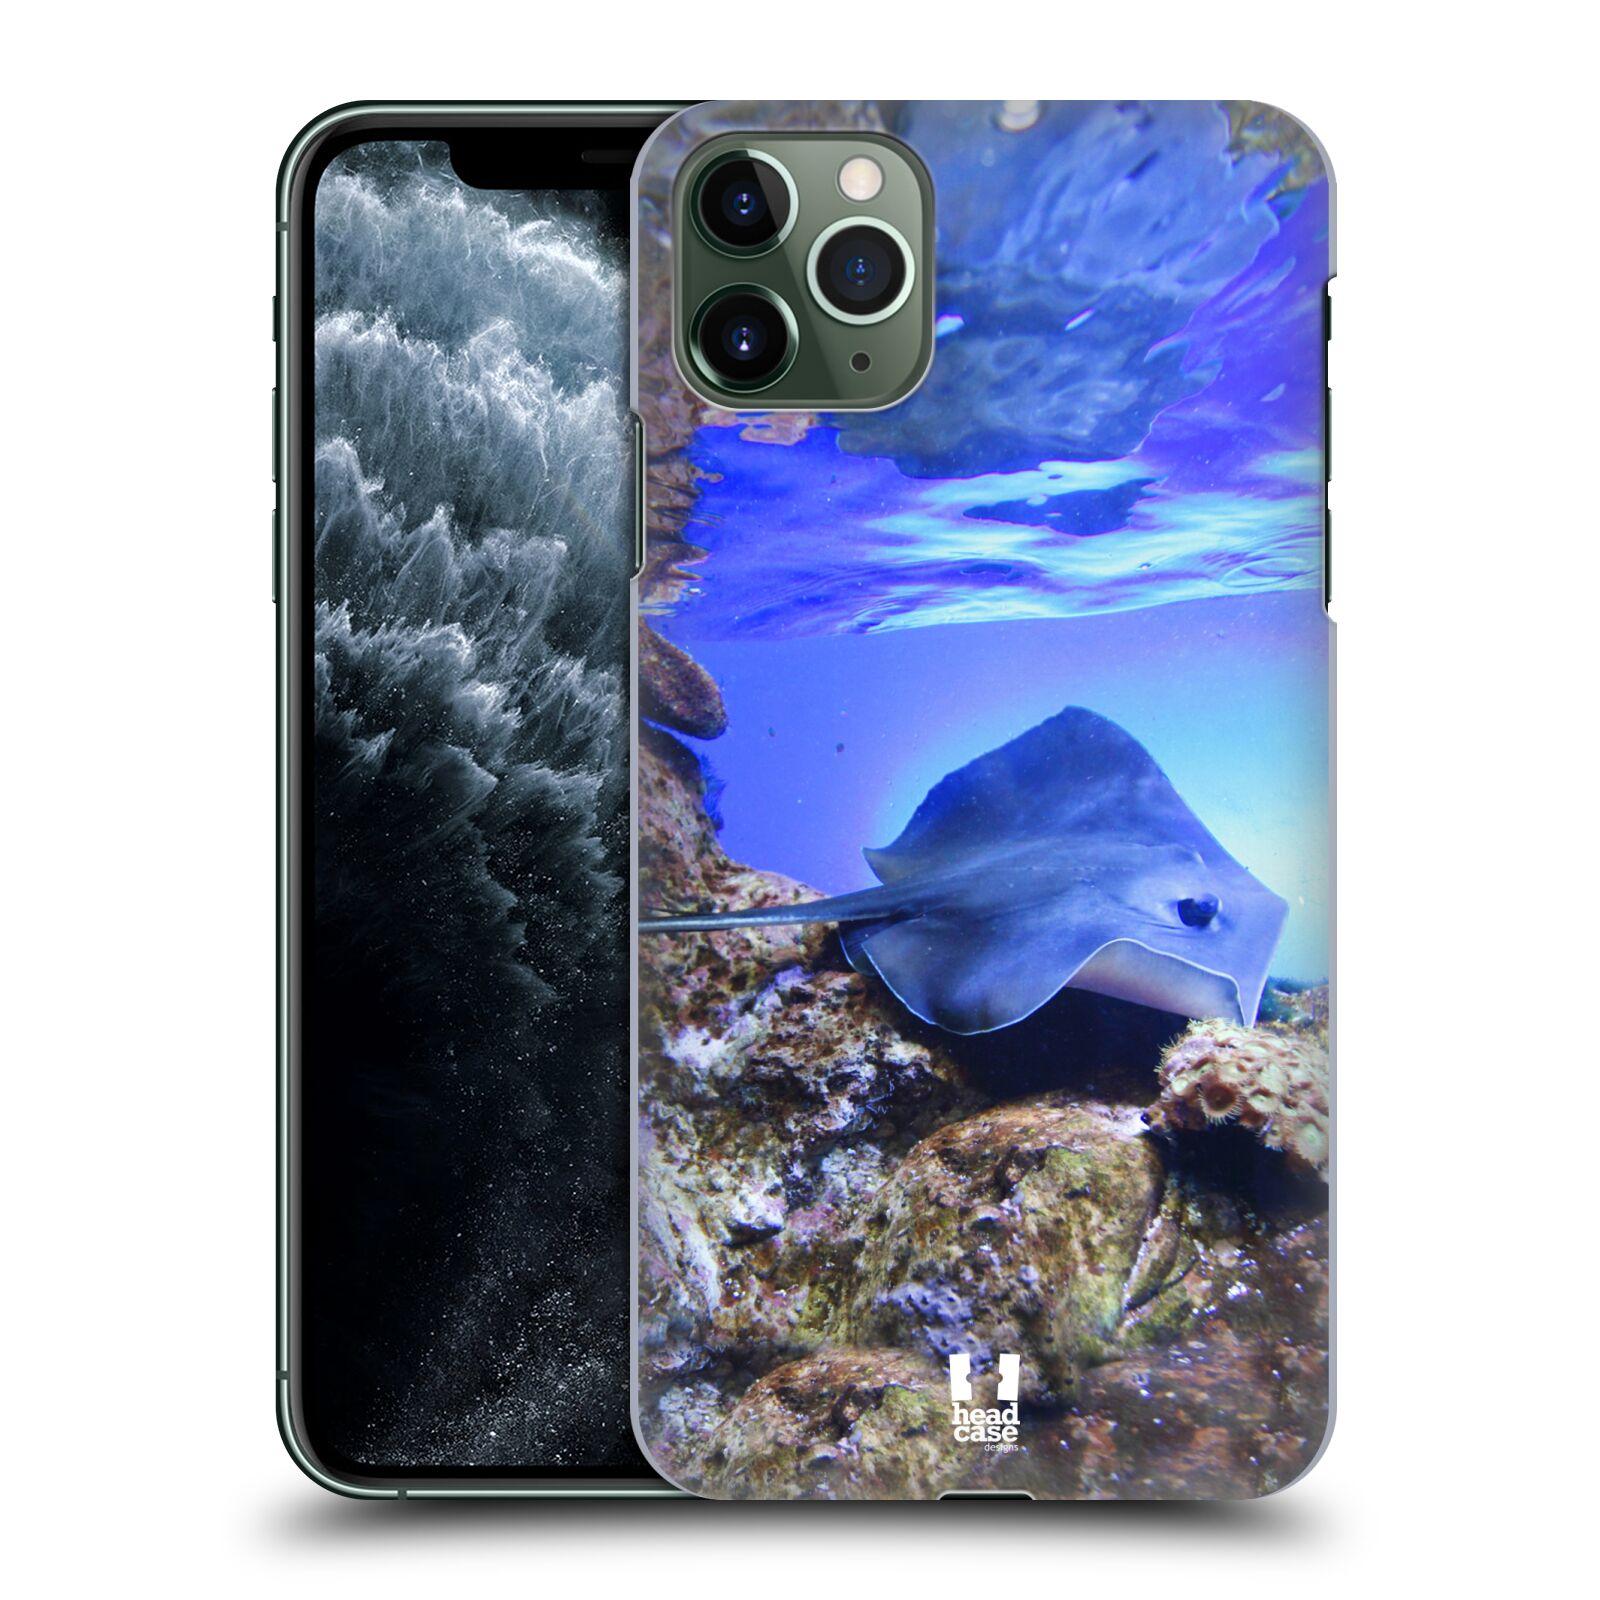 Pouzdro na mobil Apple Iphone 11 PRO MAX - HEAD CASE - vzor slavná zvířata foto rejnok